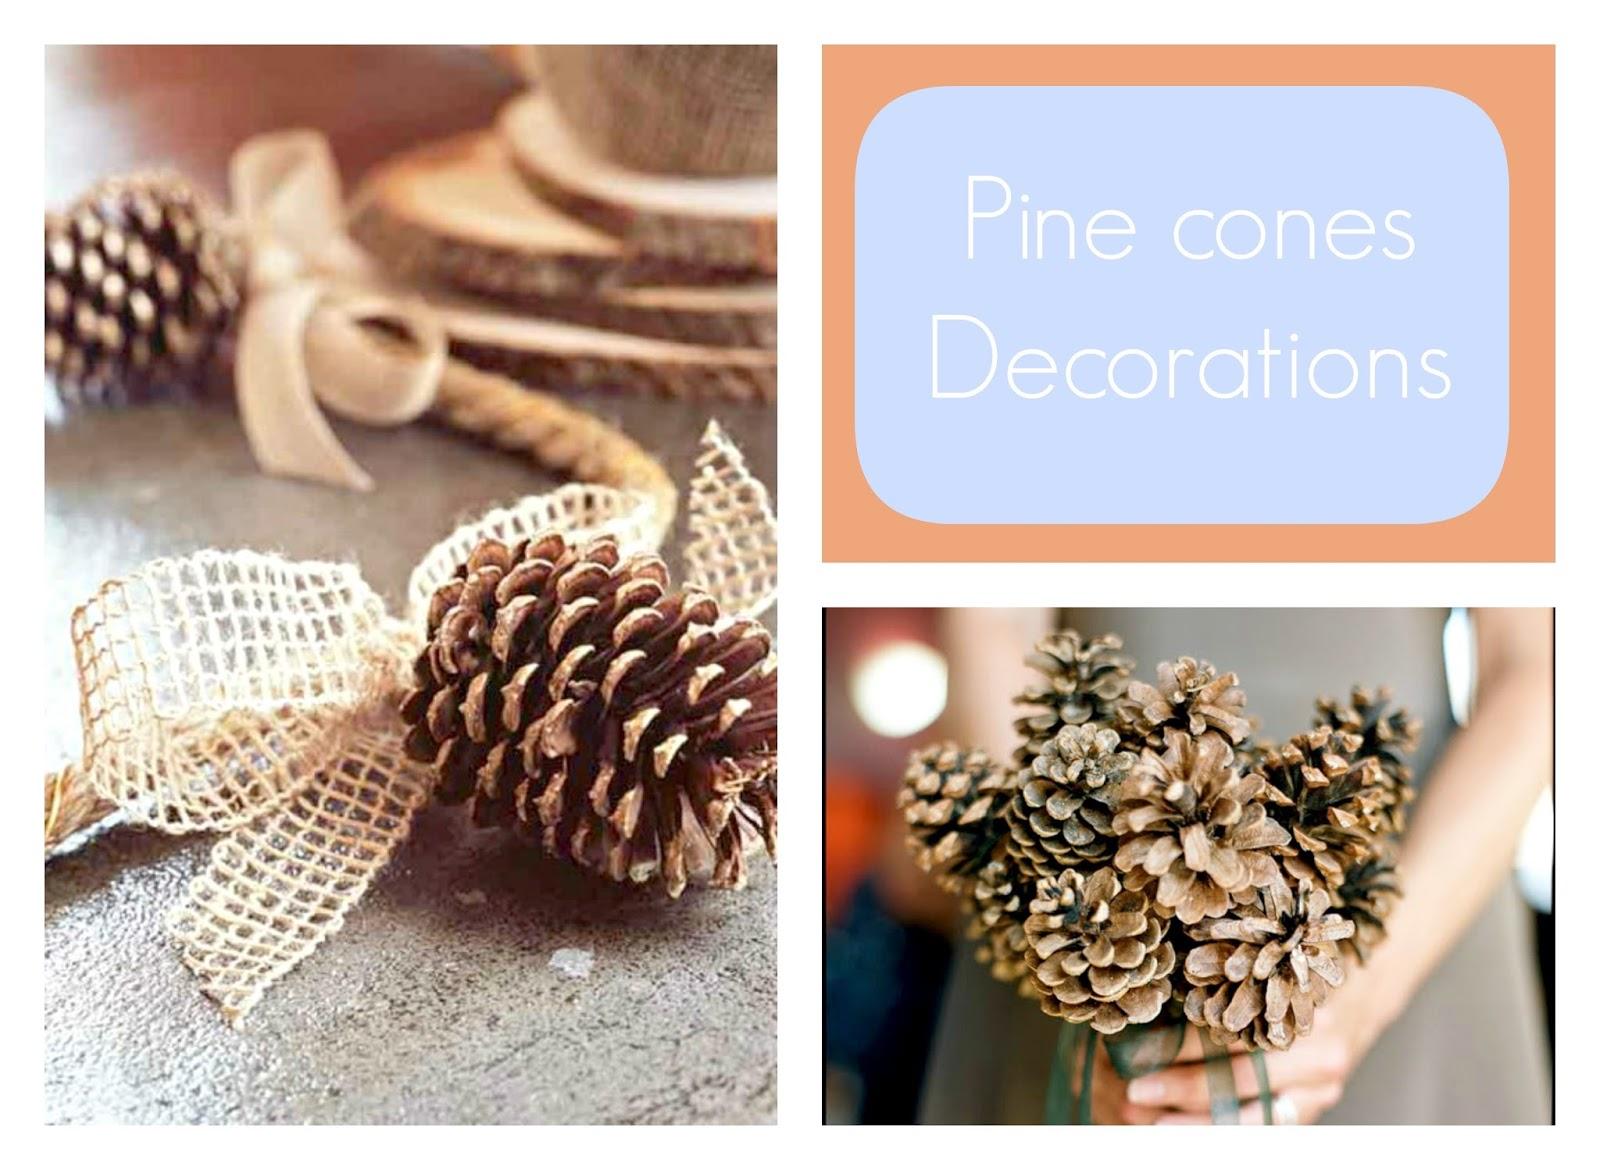 decoration with pine cones